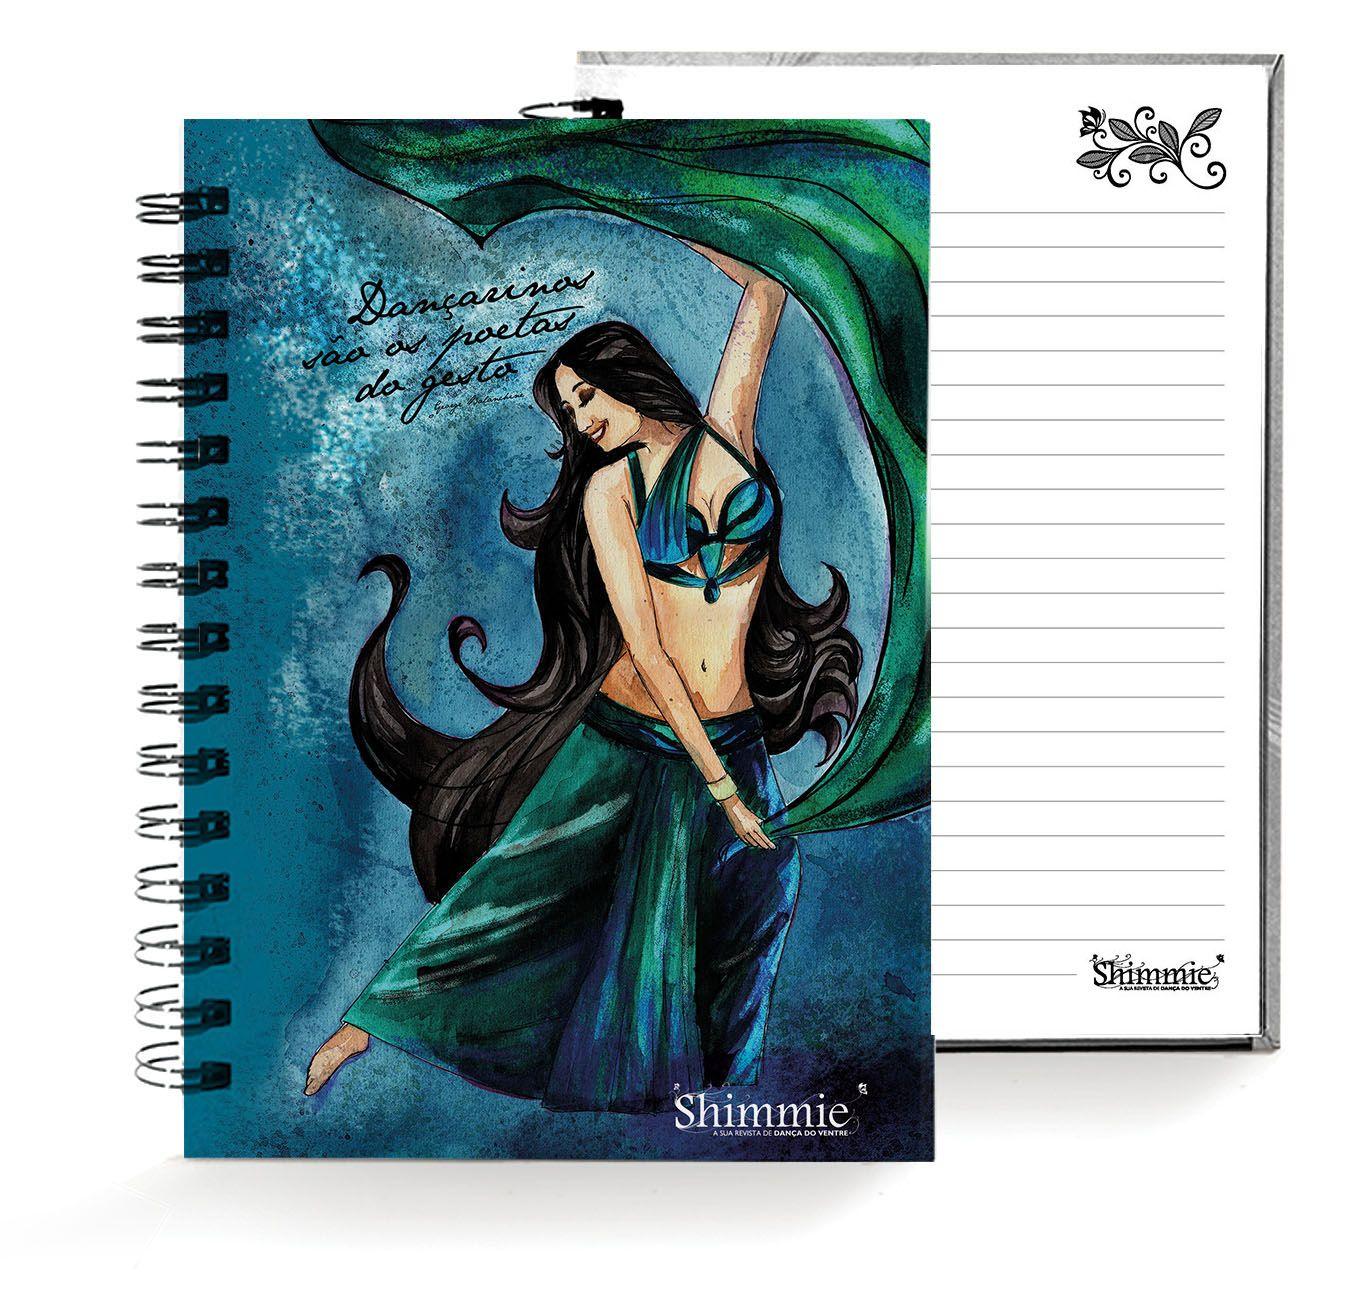 Caderno . Shimmie Verde e Azul . Pequeno